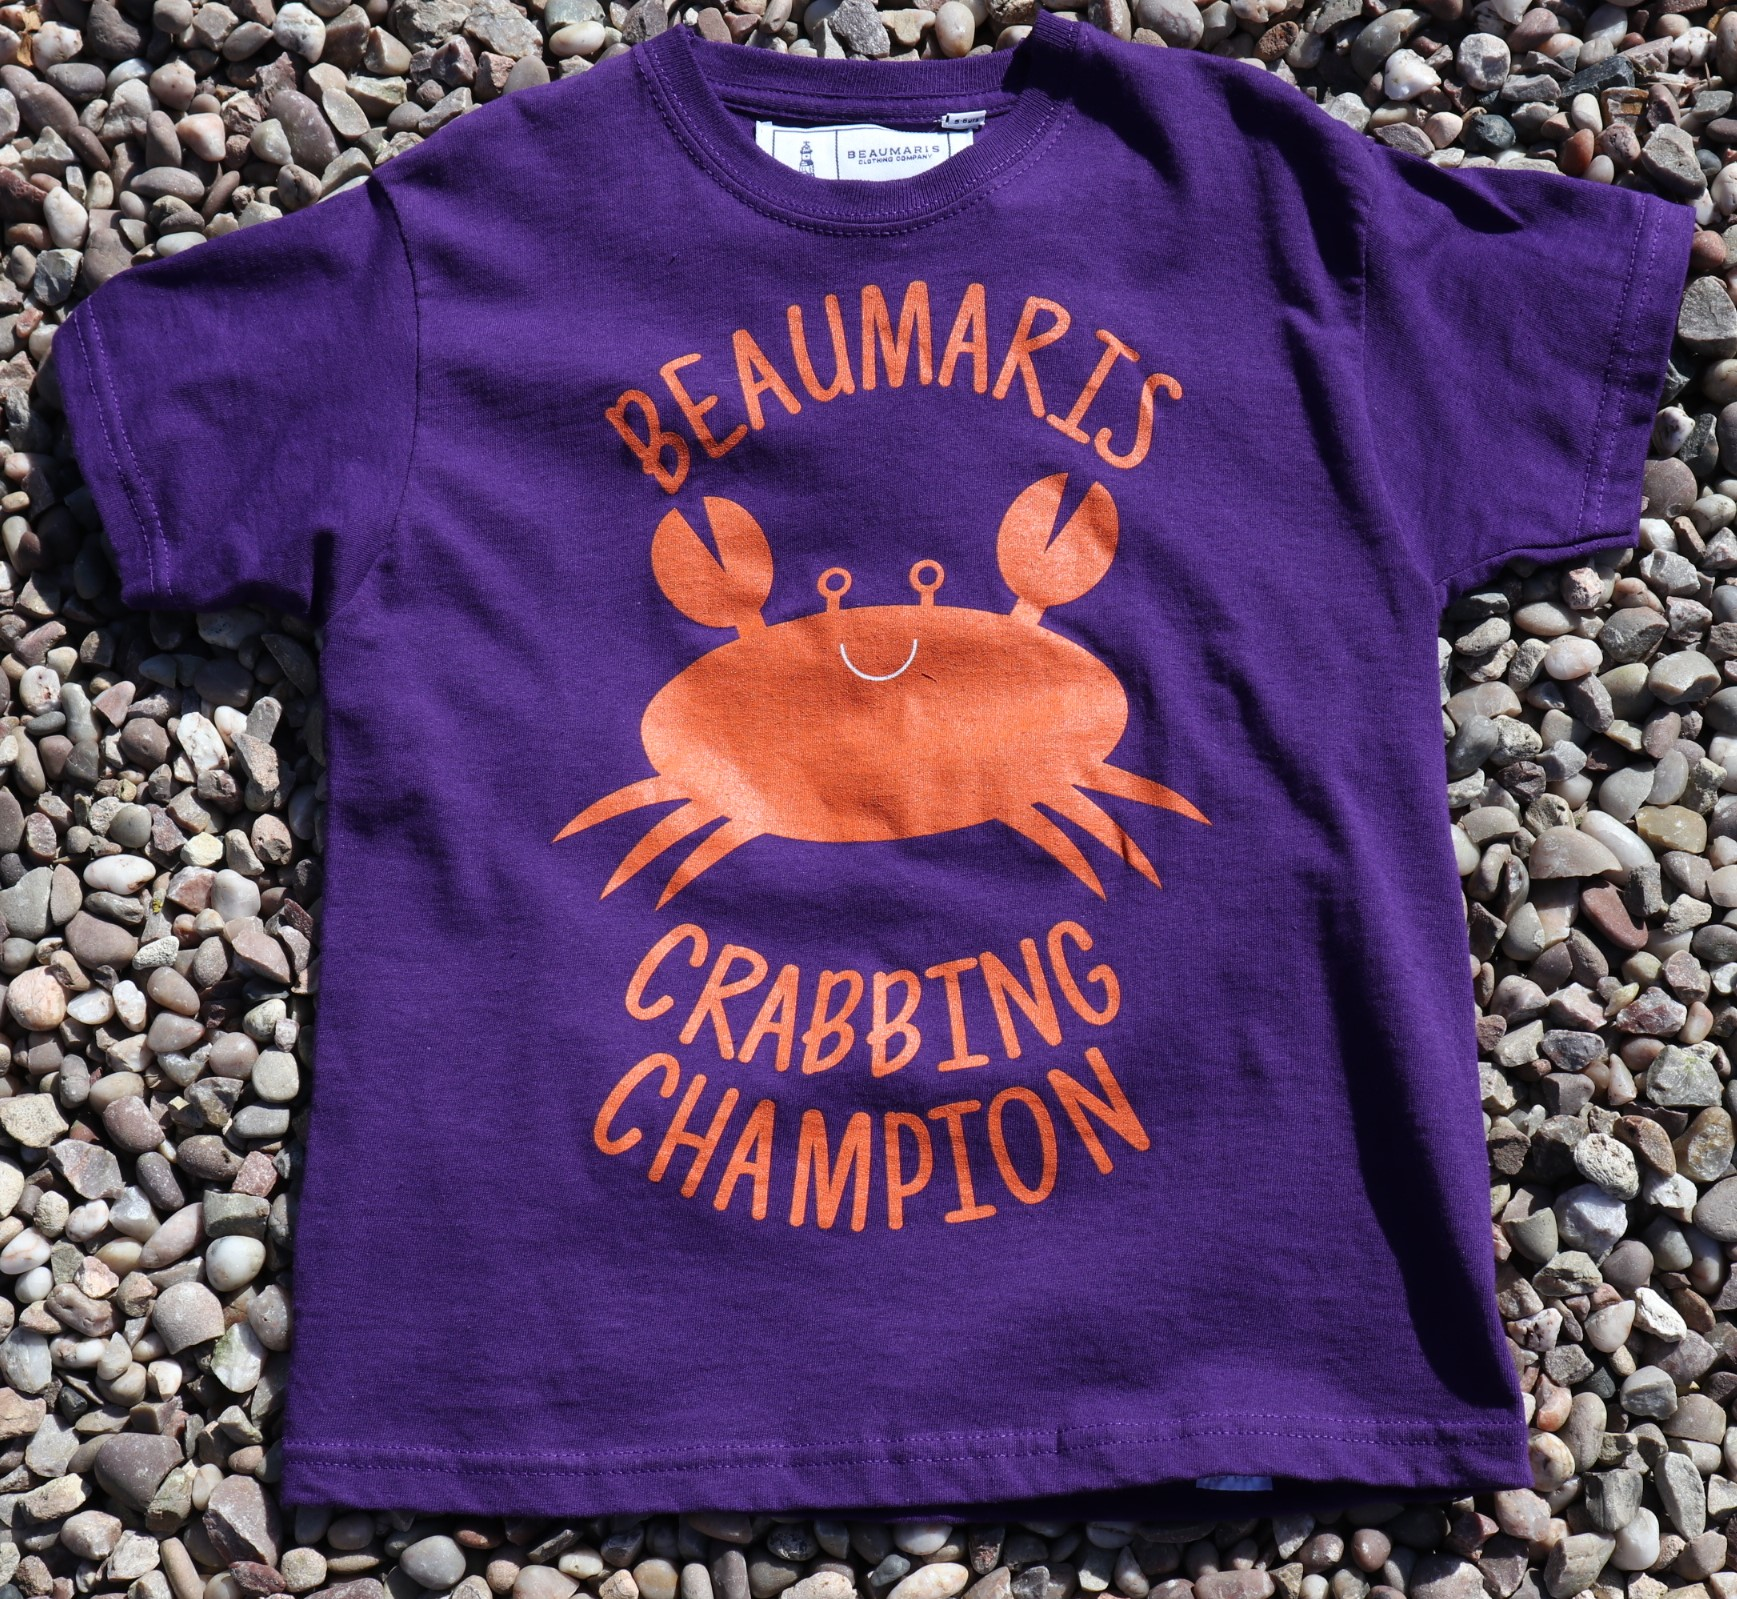 kids beaumaris crabbing champion tee purple